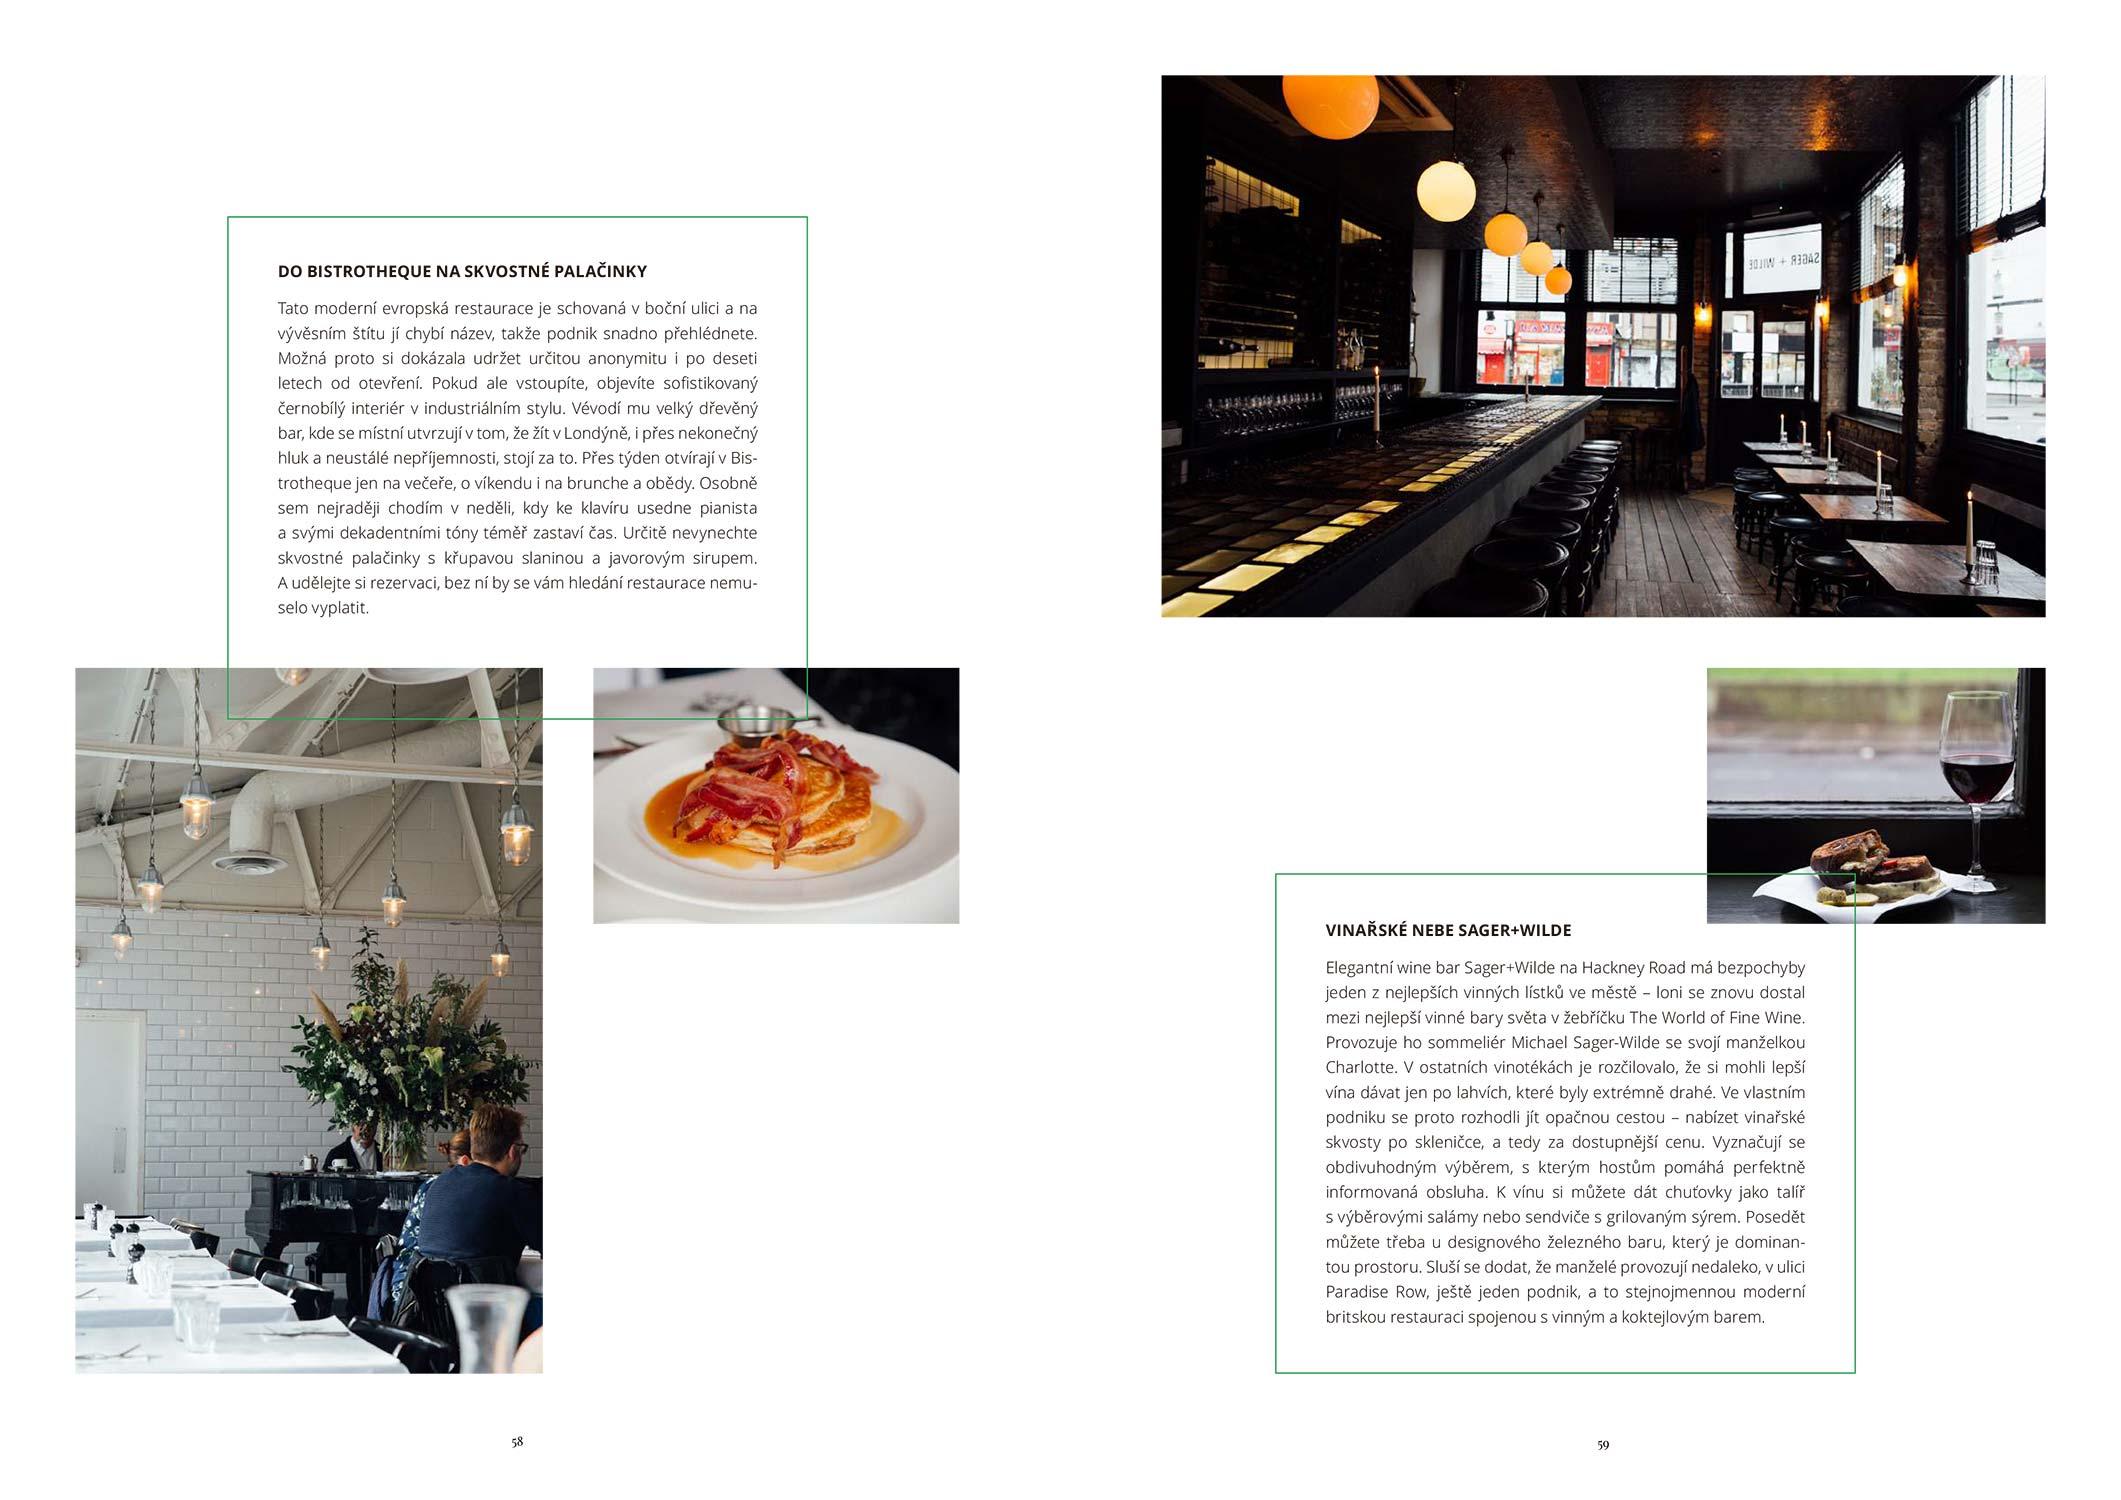 MonicaRGoya-Hackney-City-Guide-3.jpg